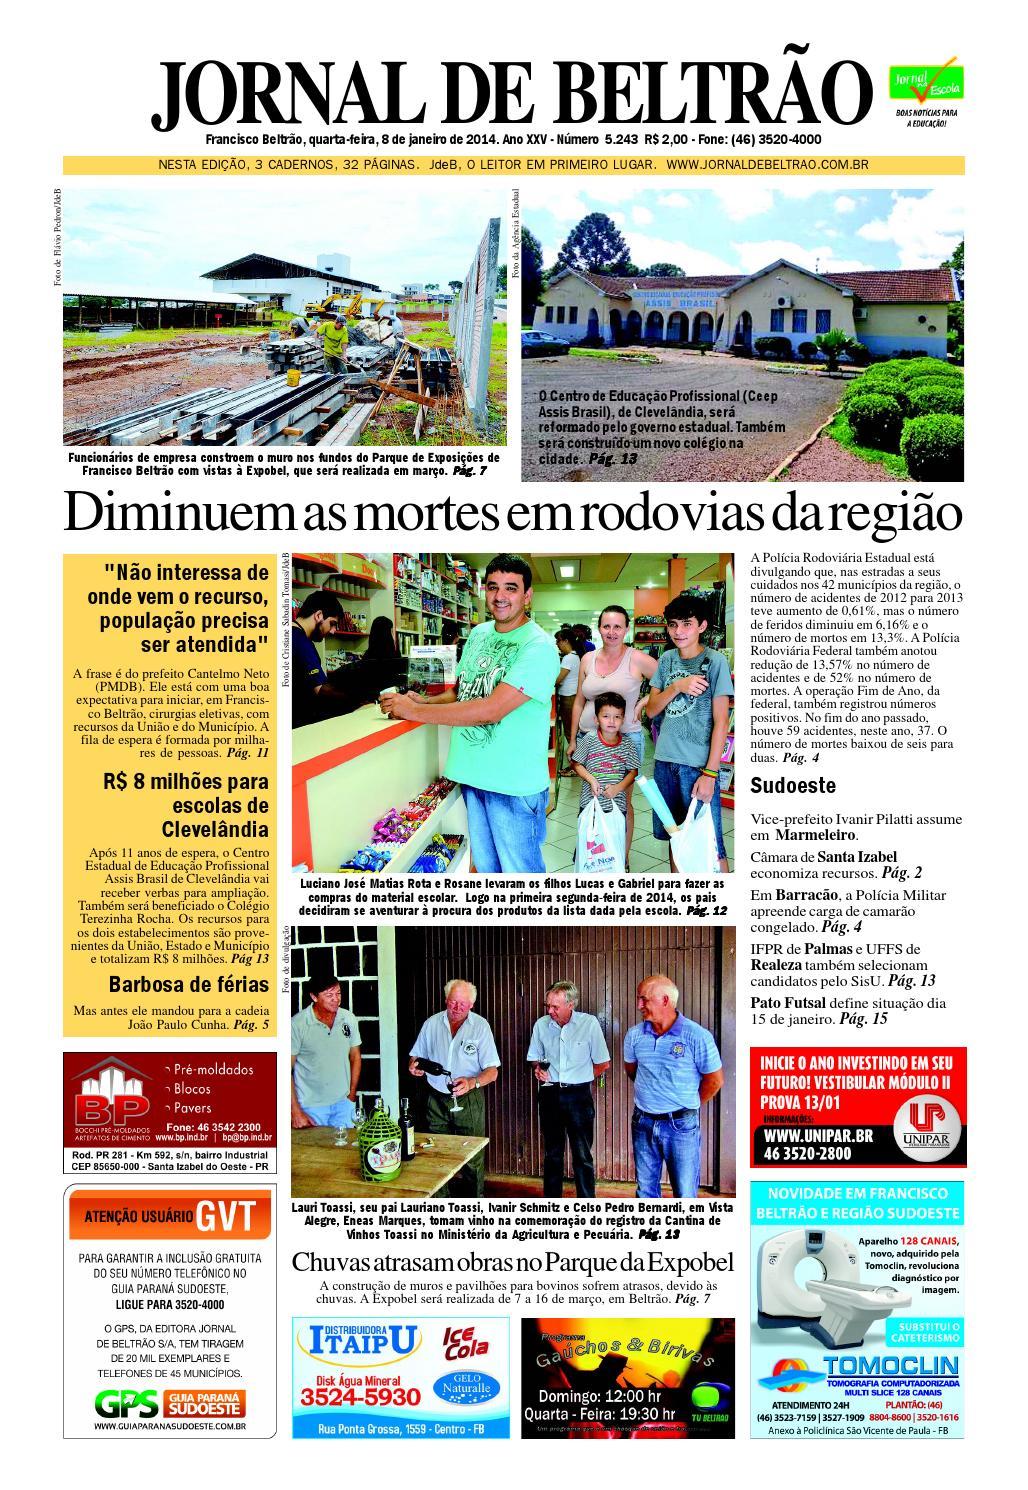 396df08f20 Jornaldebeltrao 5243 8-01-2014.pdf by Orangotoe - issuu